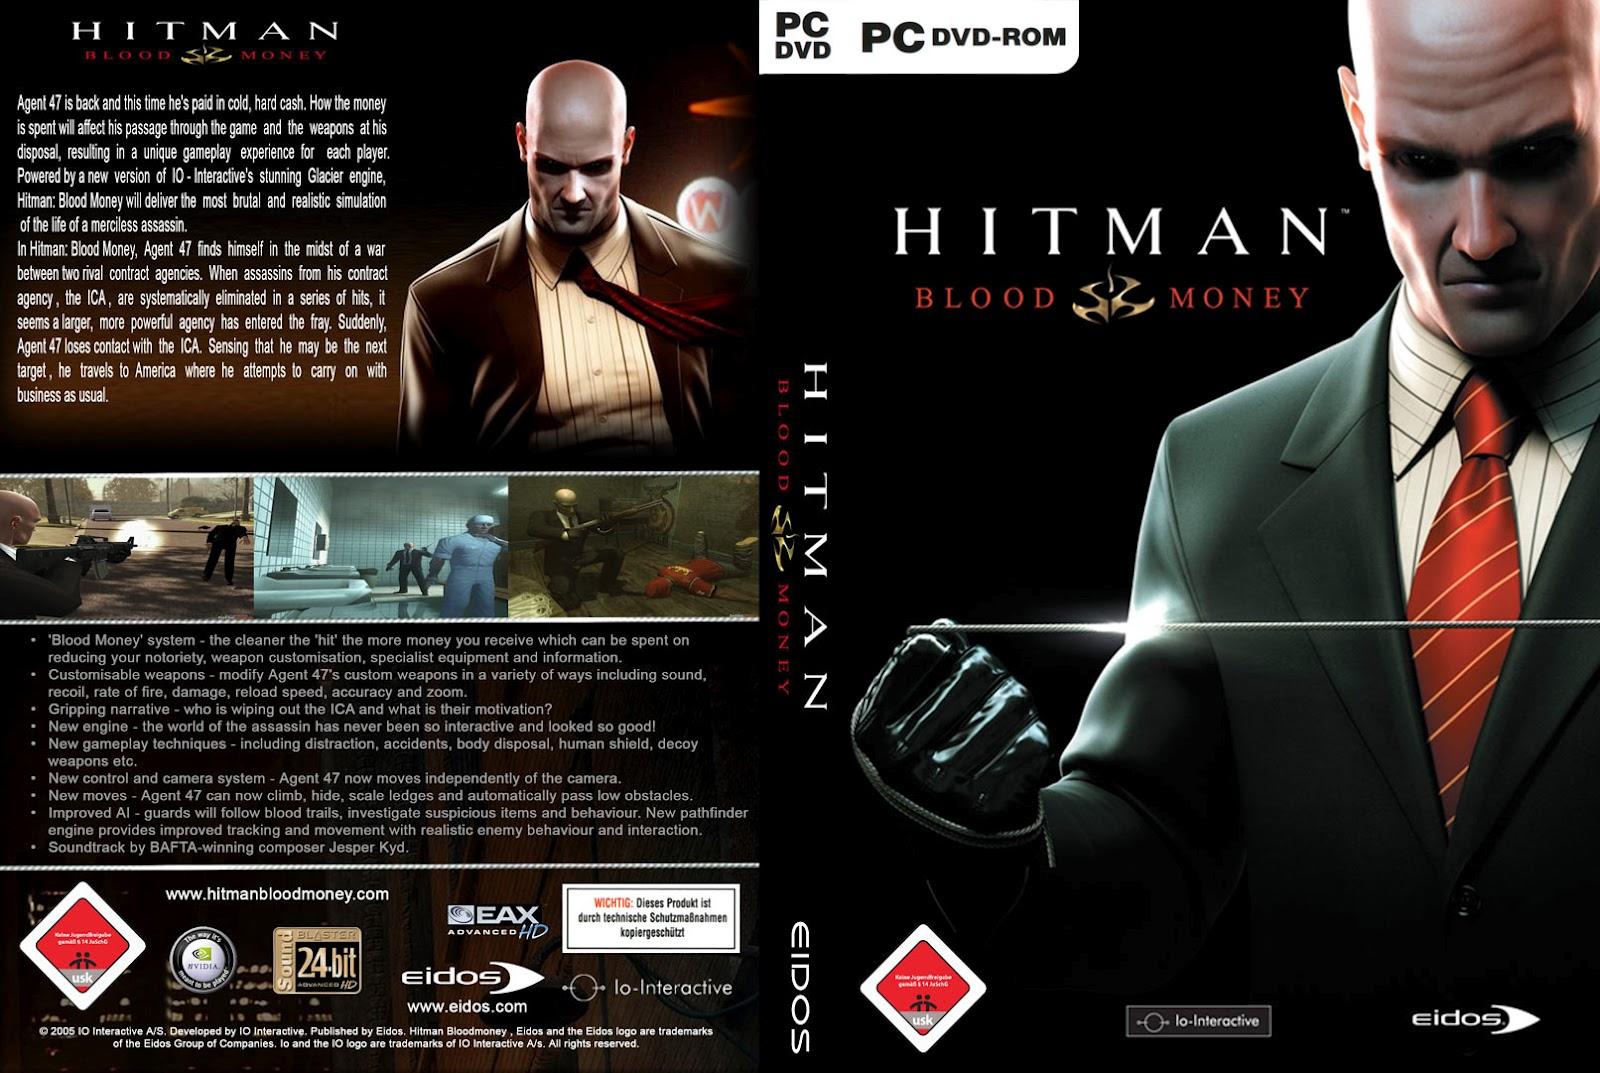 hitman blood money download pc free full version iso